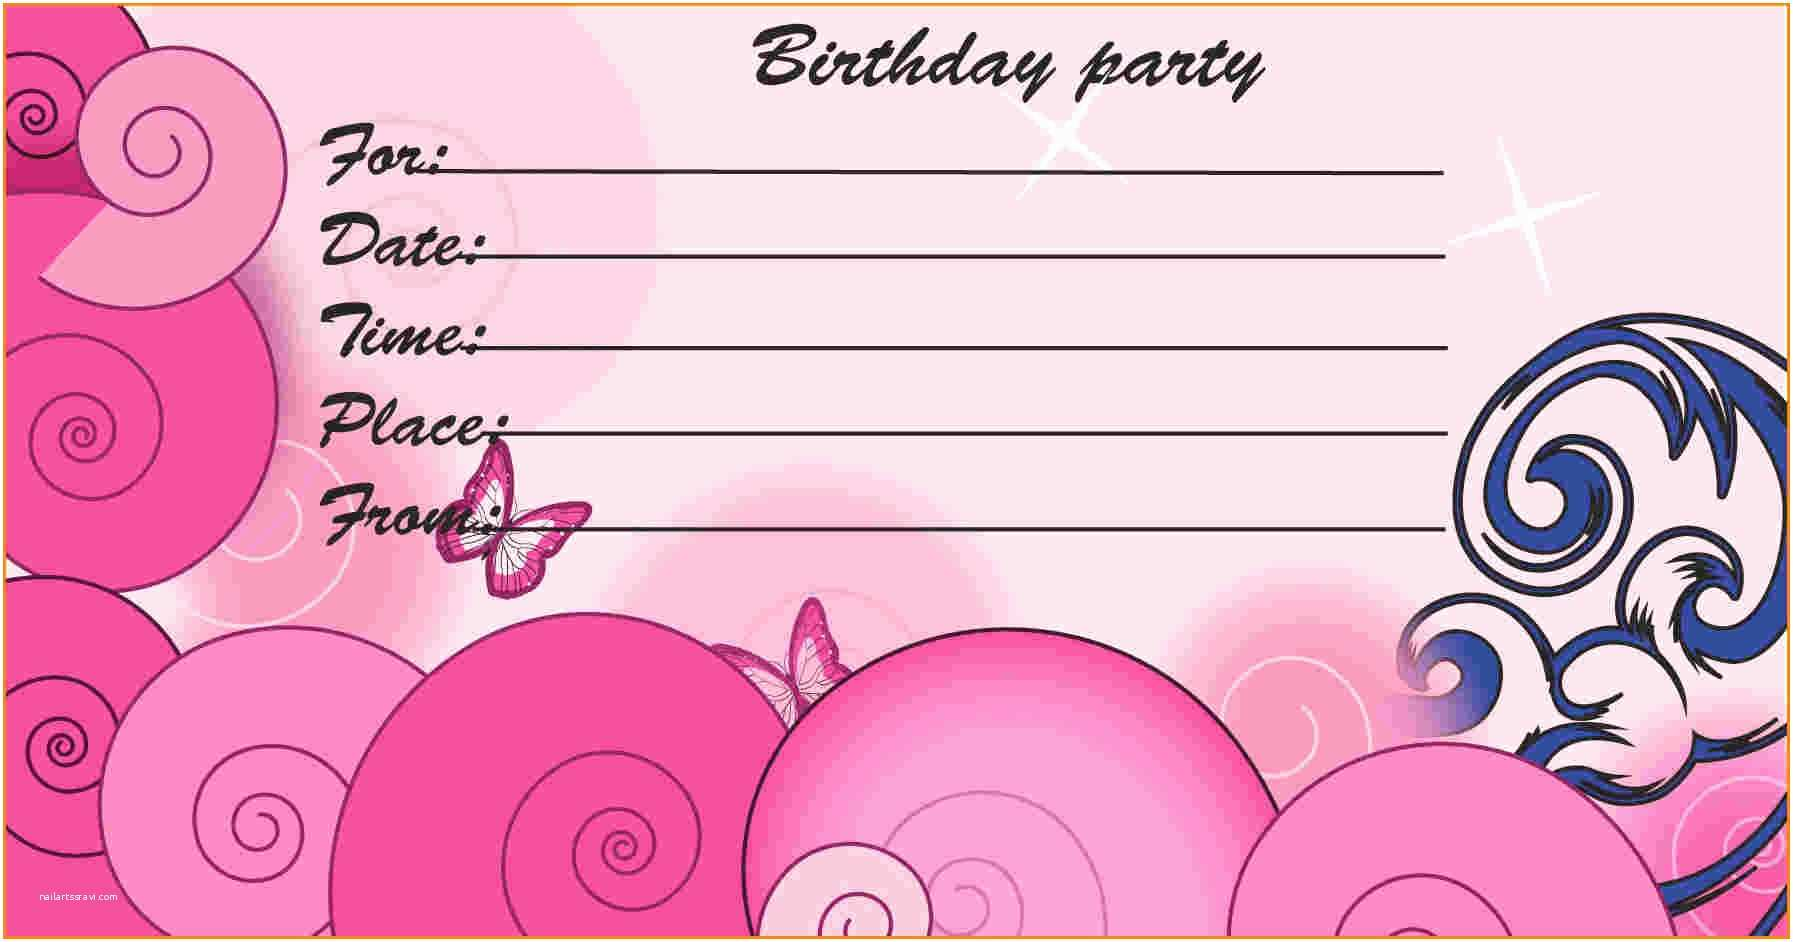 Printable Birthday Party Invitations Free Printable Kids Birthday Party Invitations Templates